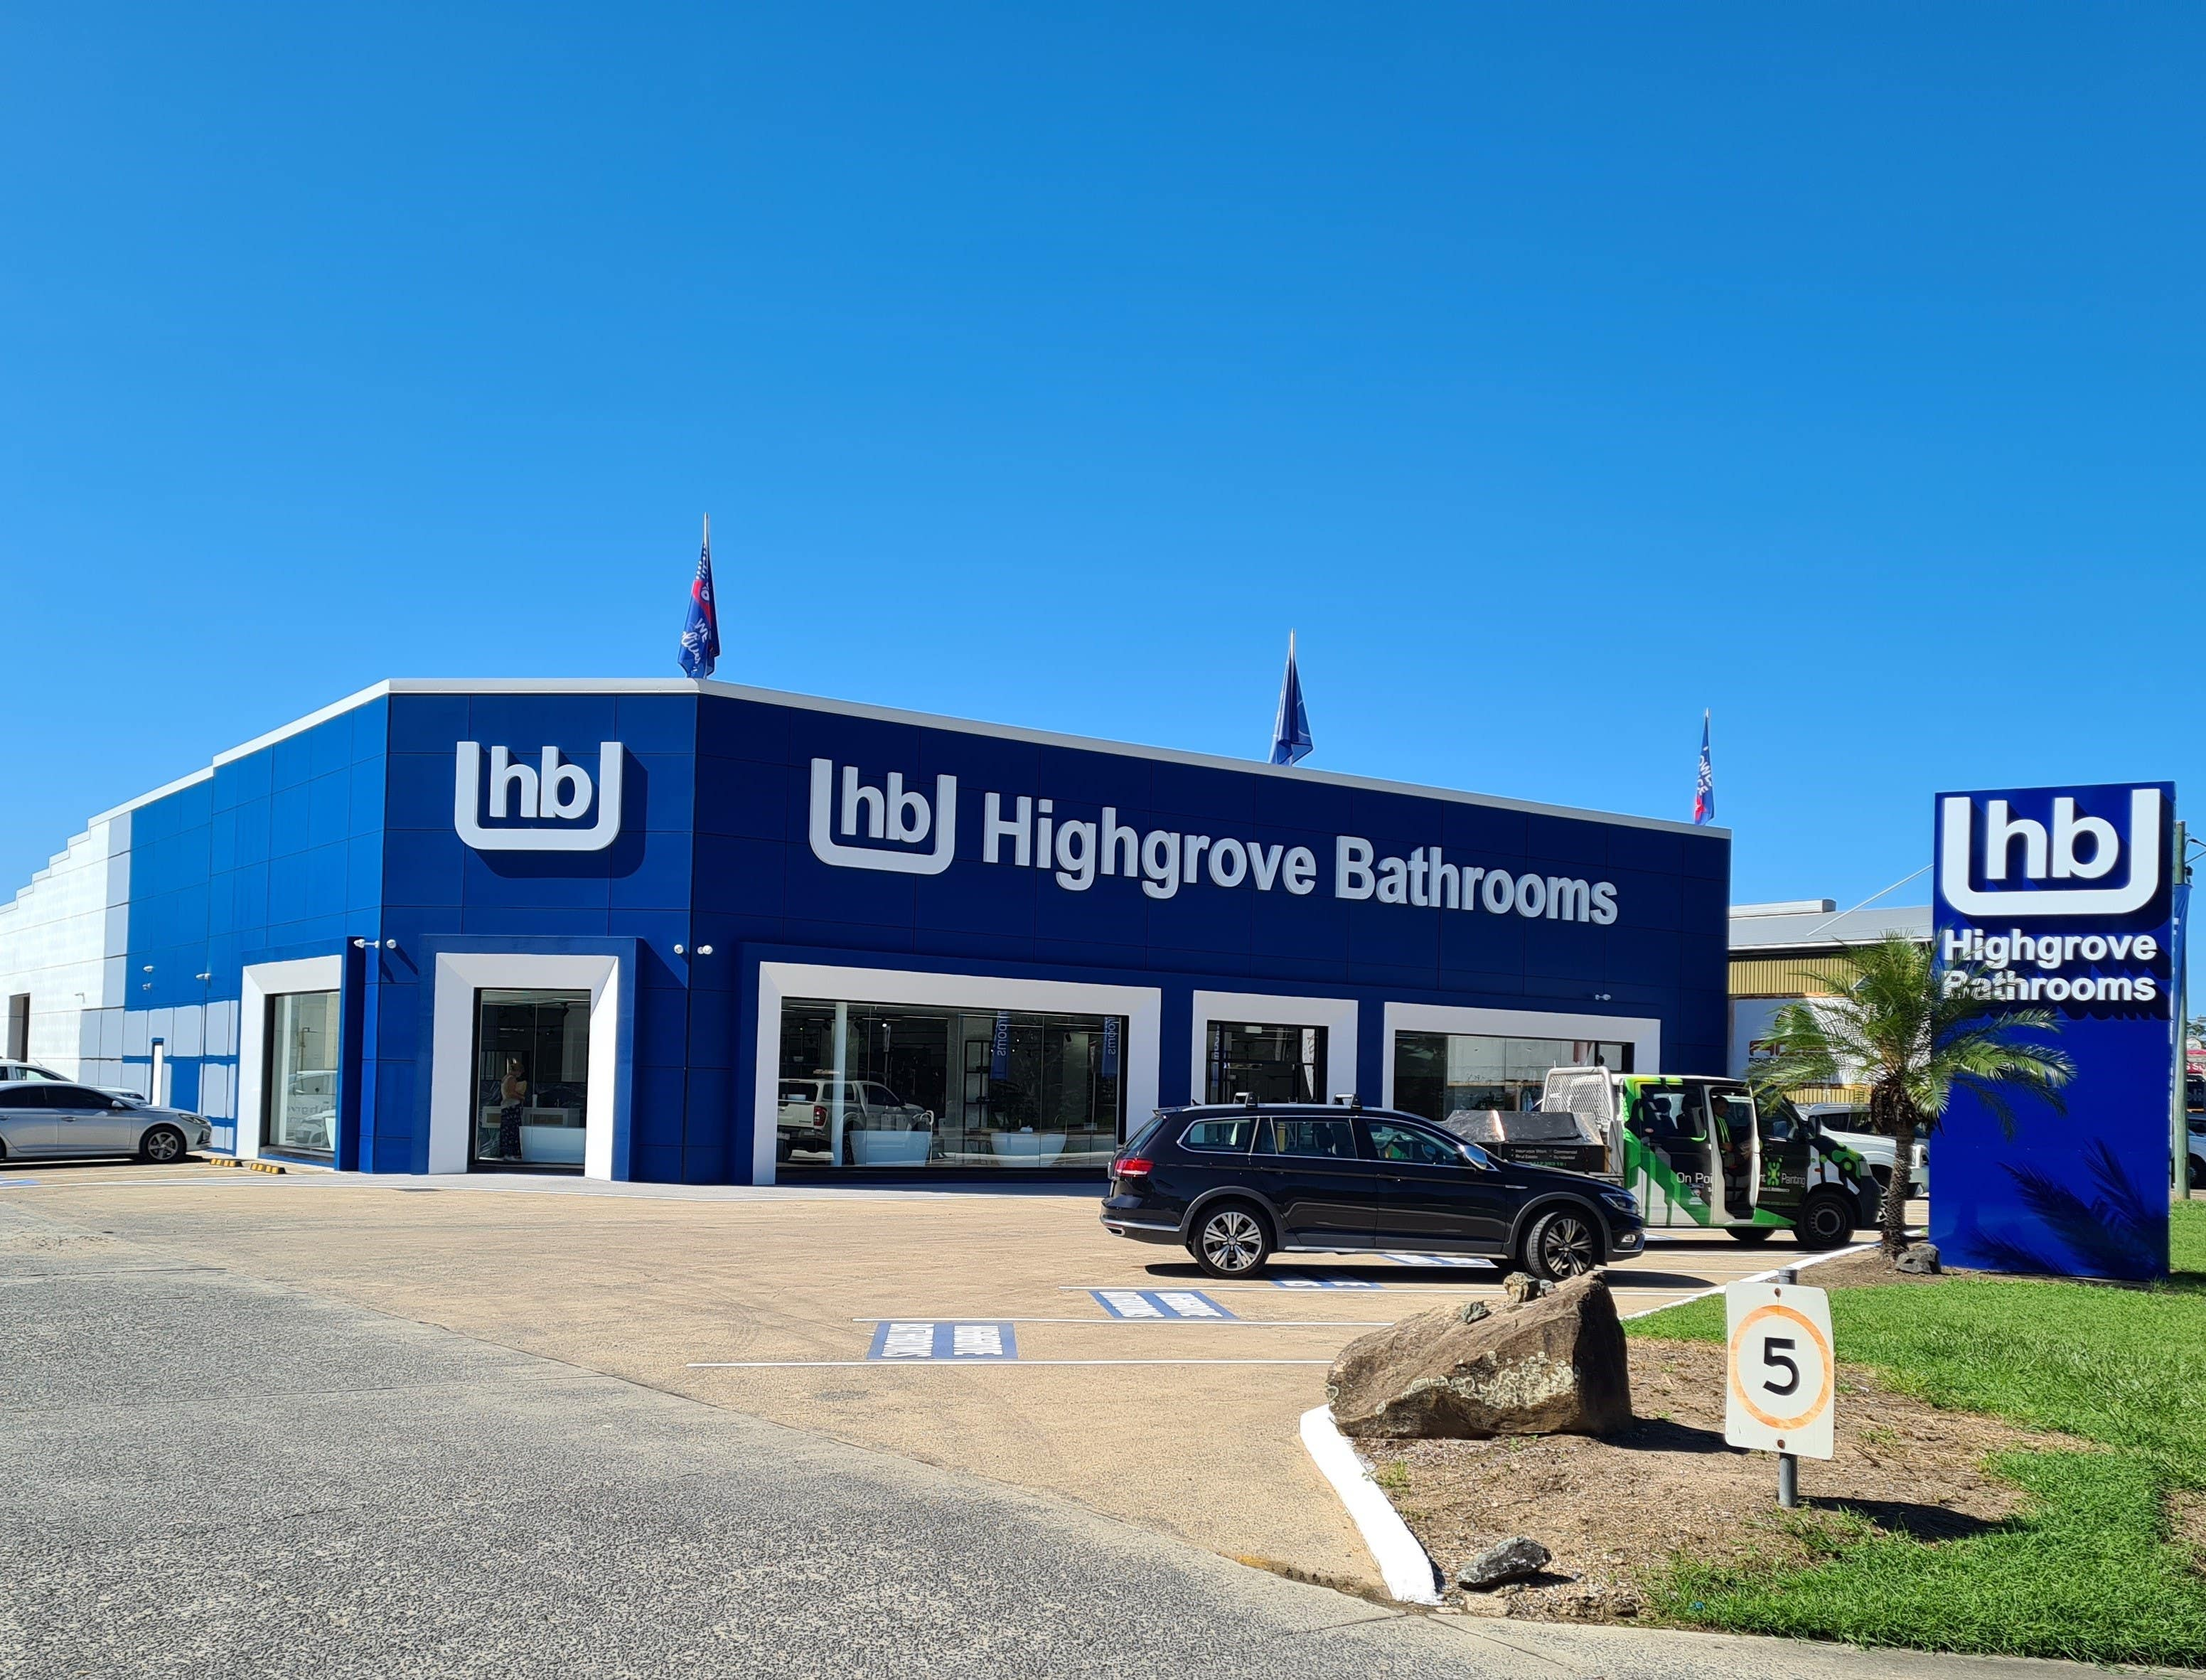 Highgrove Bathrooms - Underwood